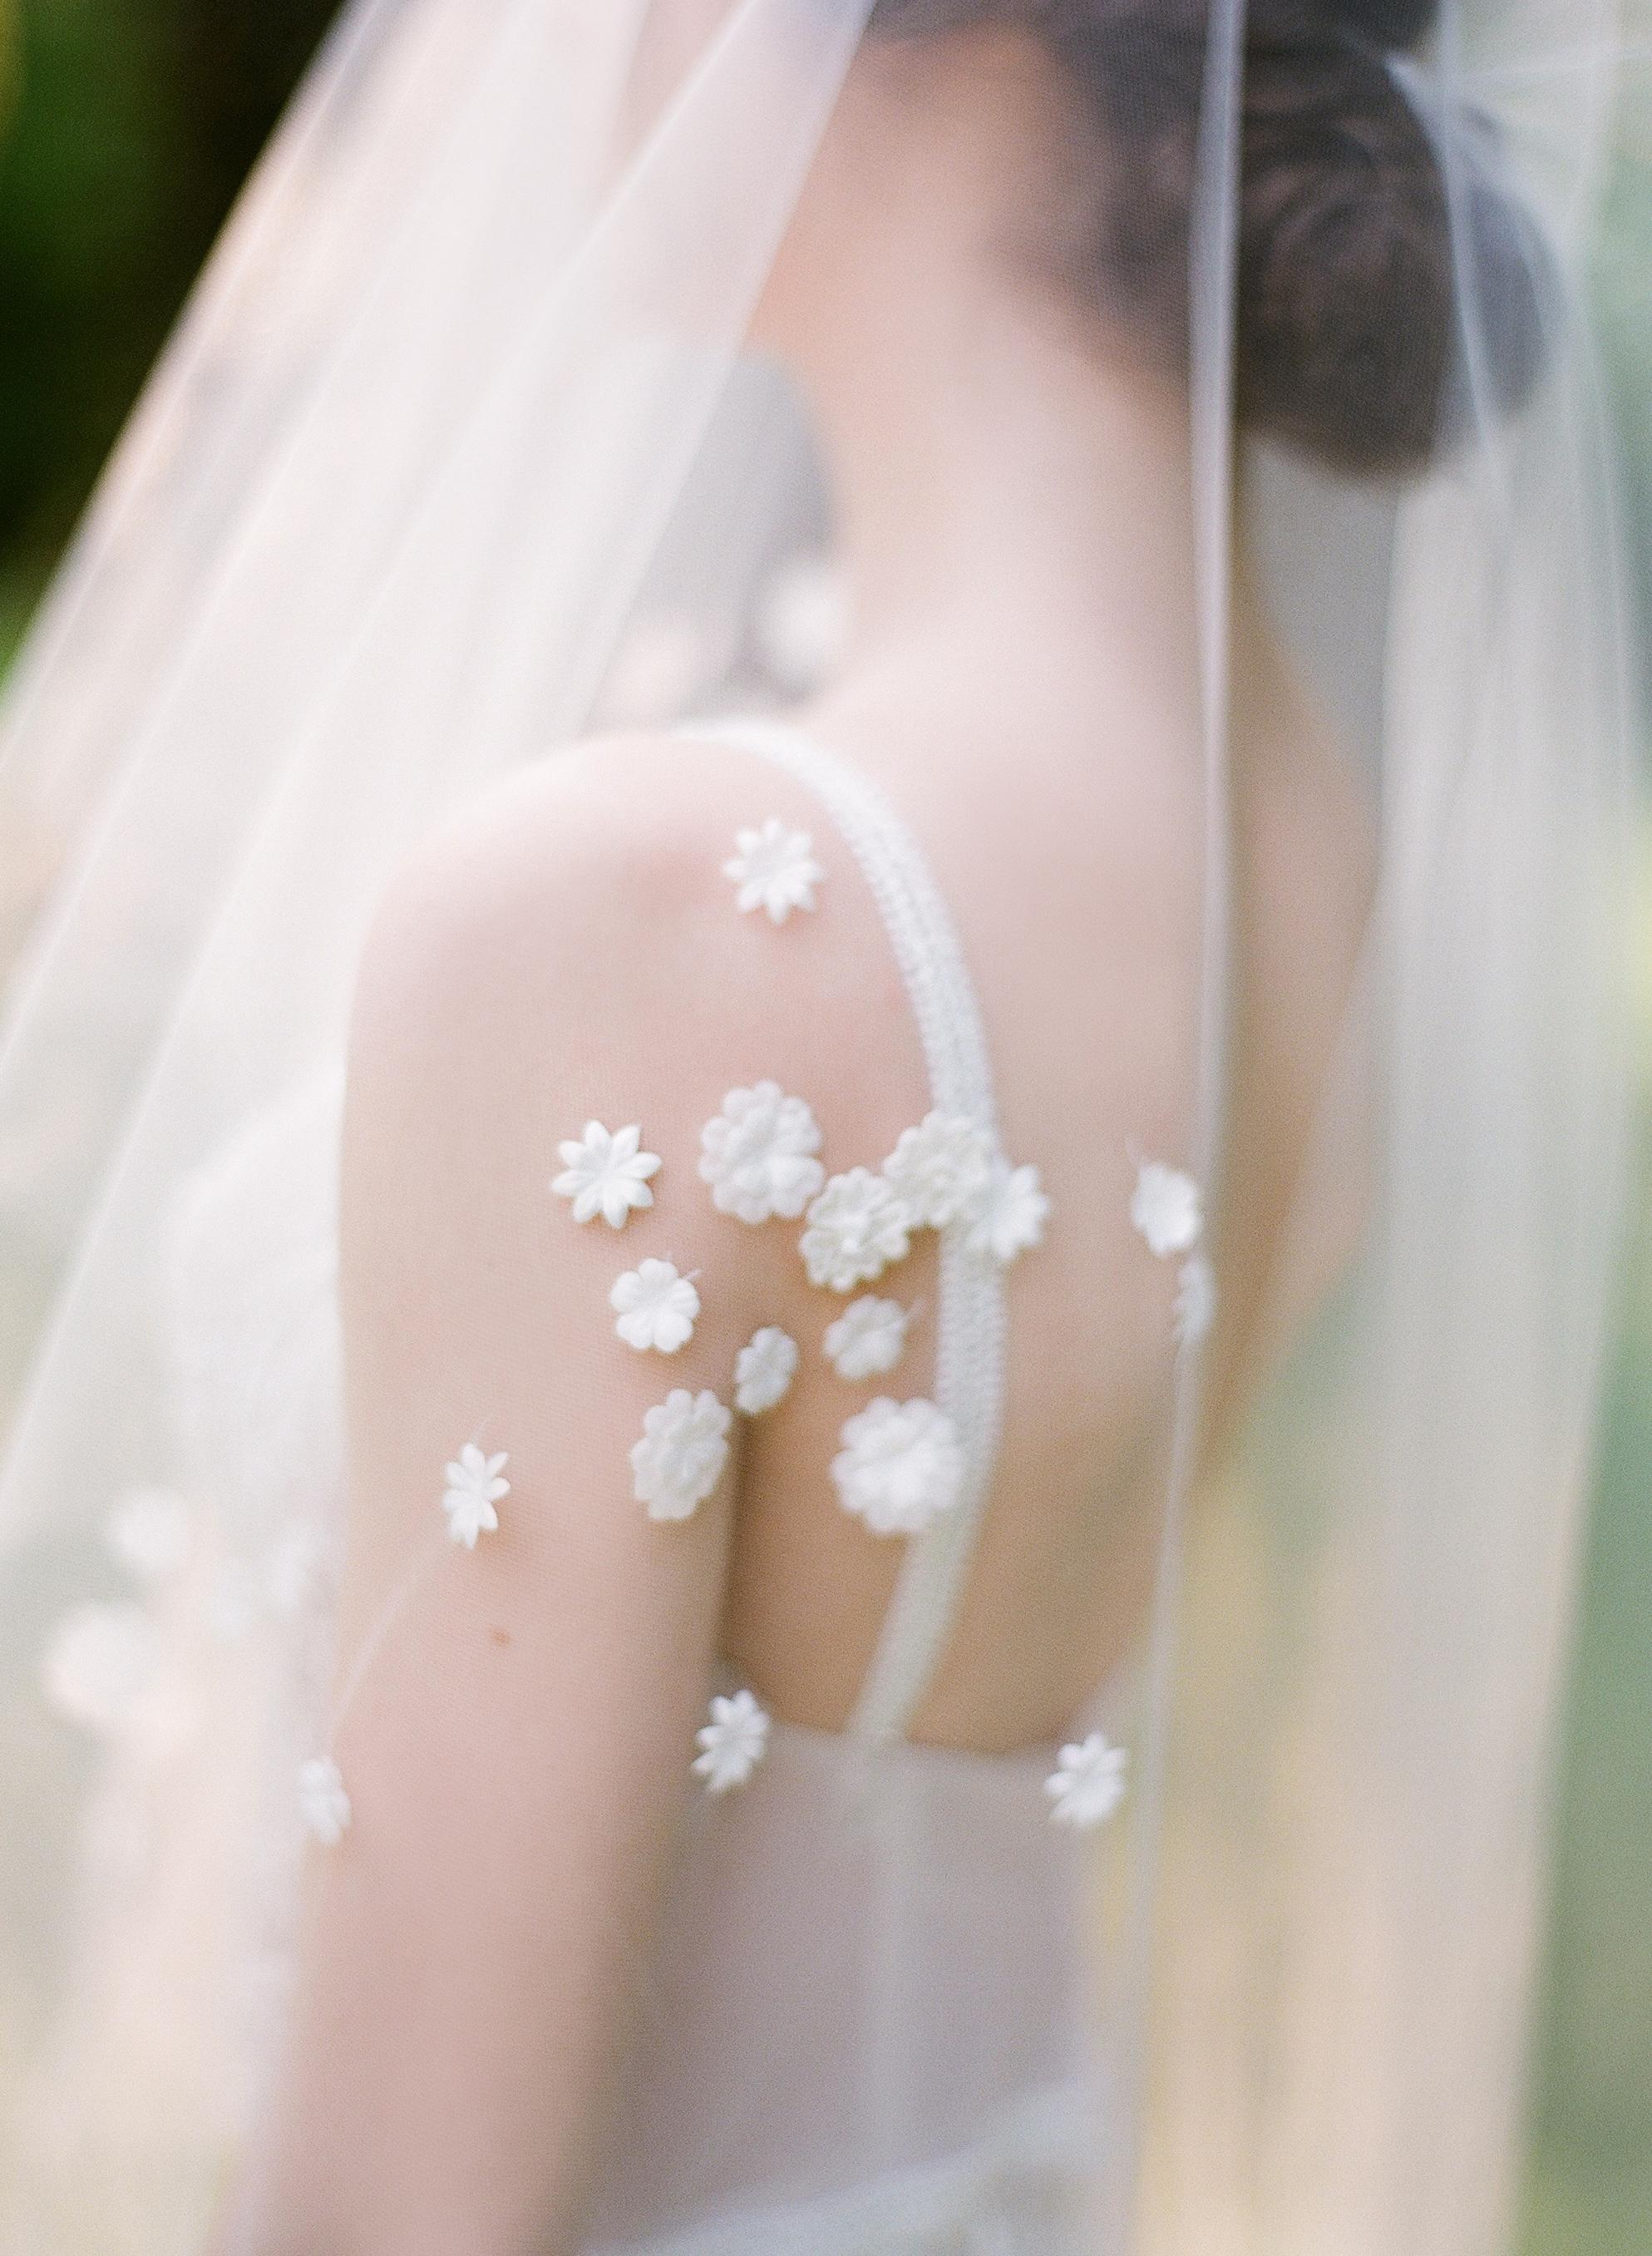 wedding veil with small floral appliqués